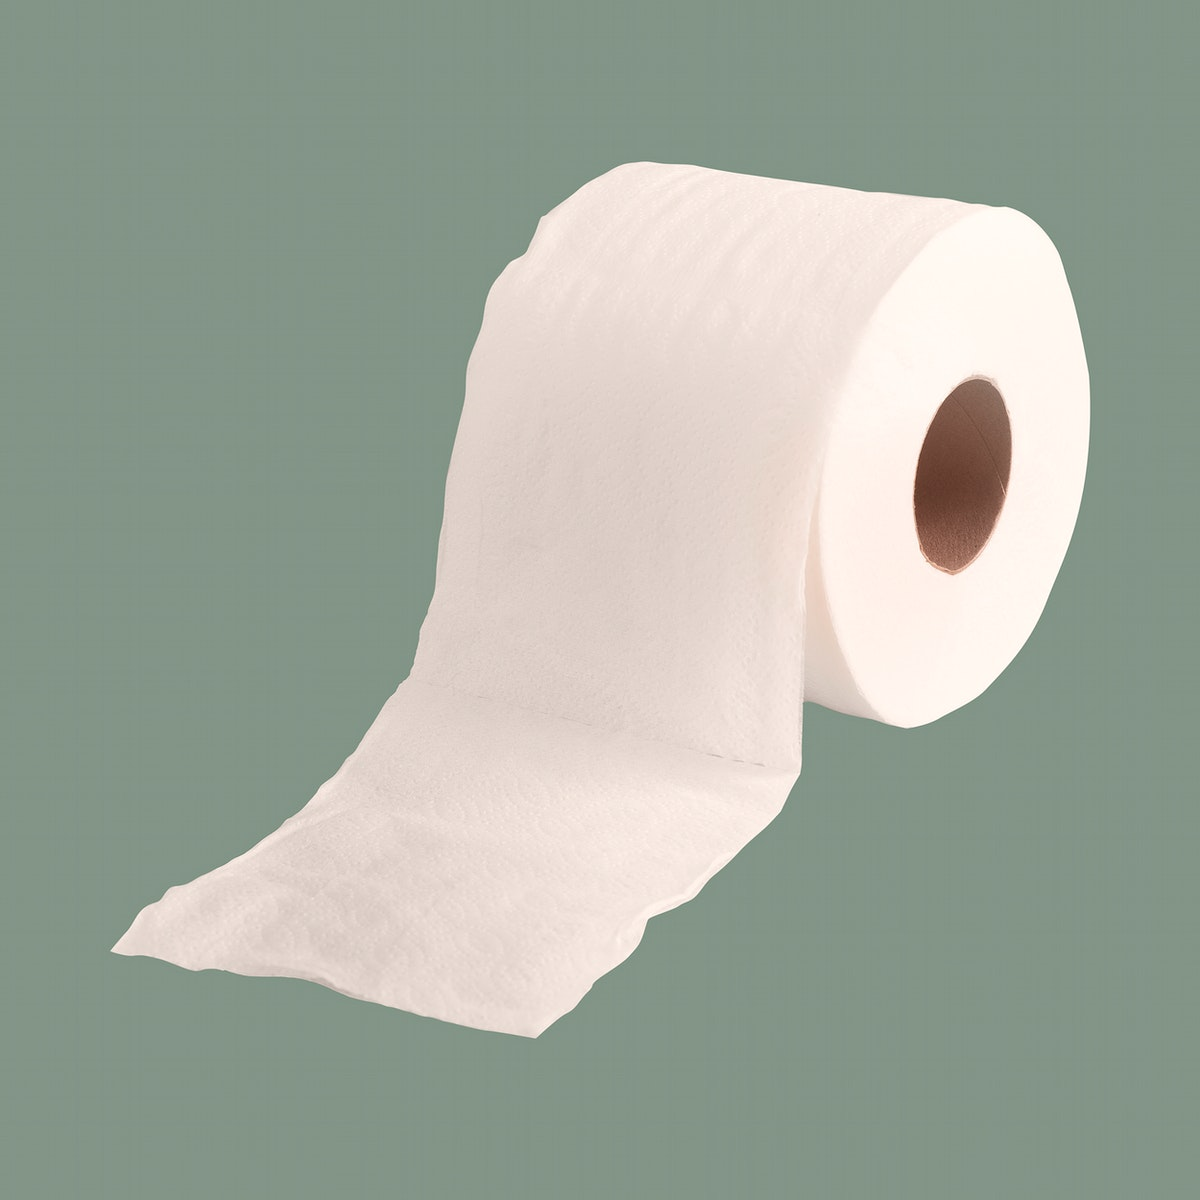 Tissue paper roll element mockup illustration